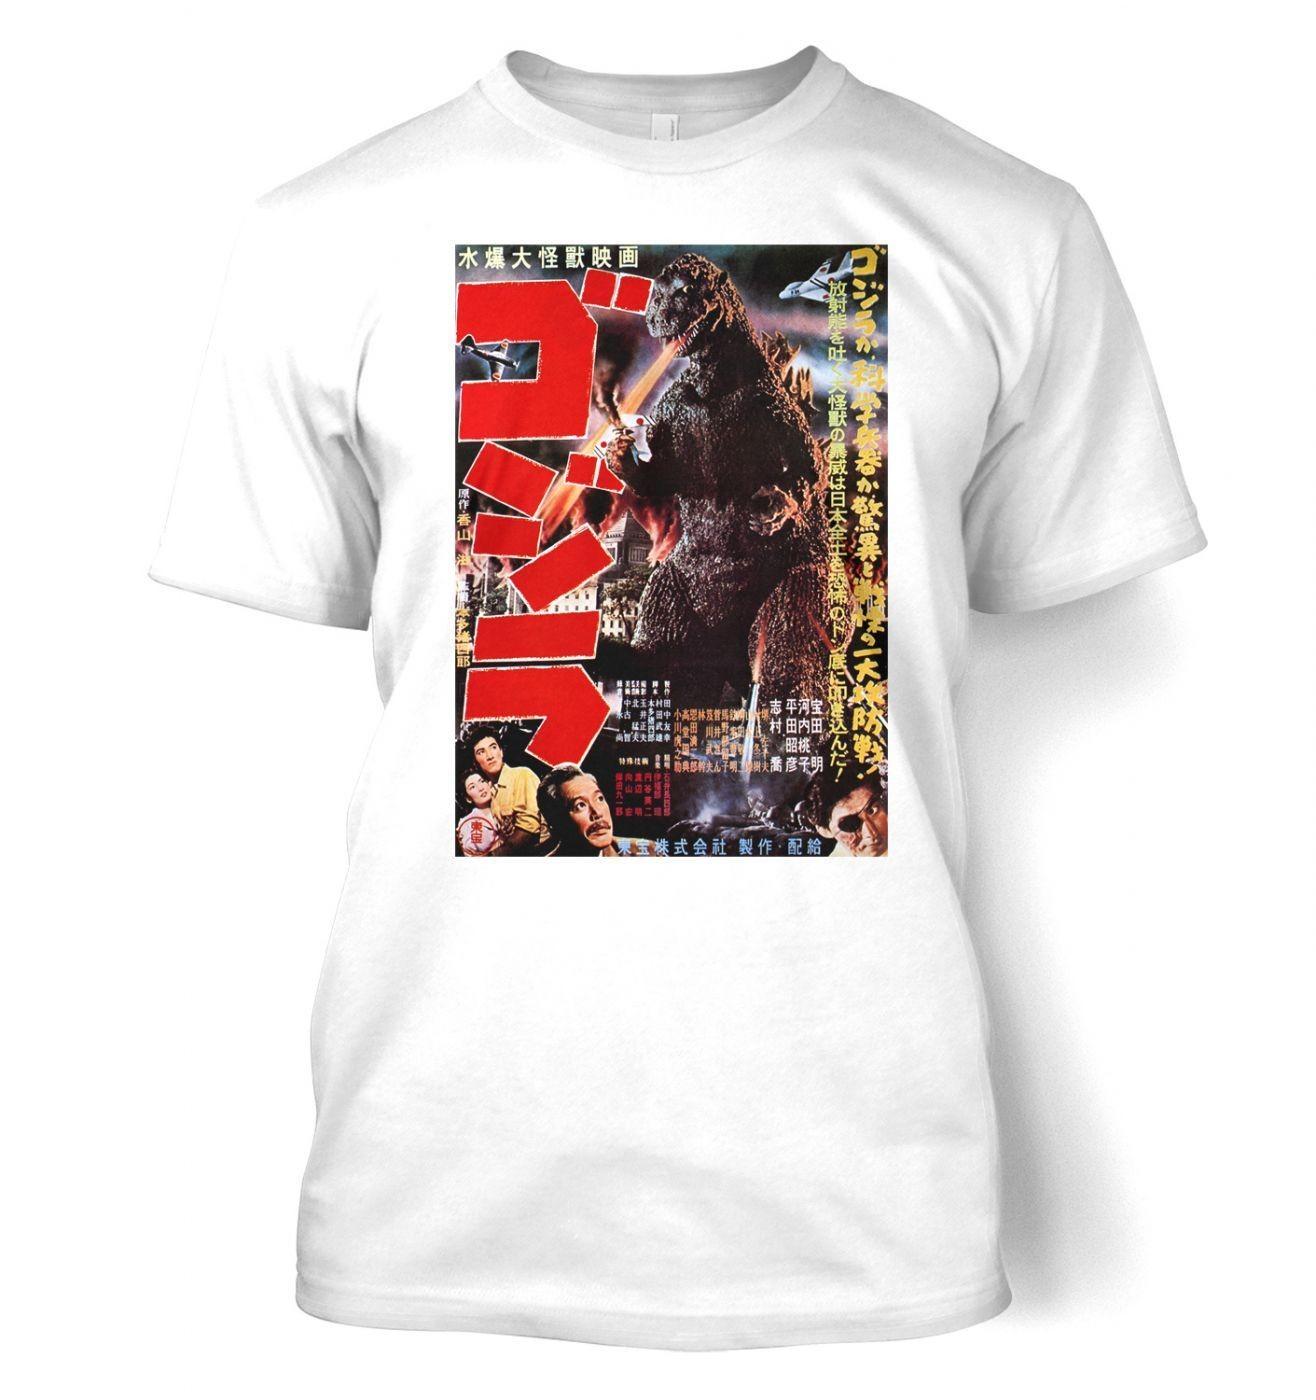 Godzilla Japanese men's t-shirt